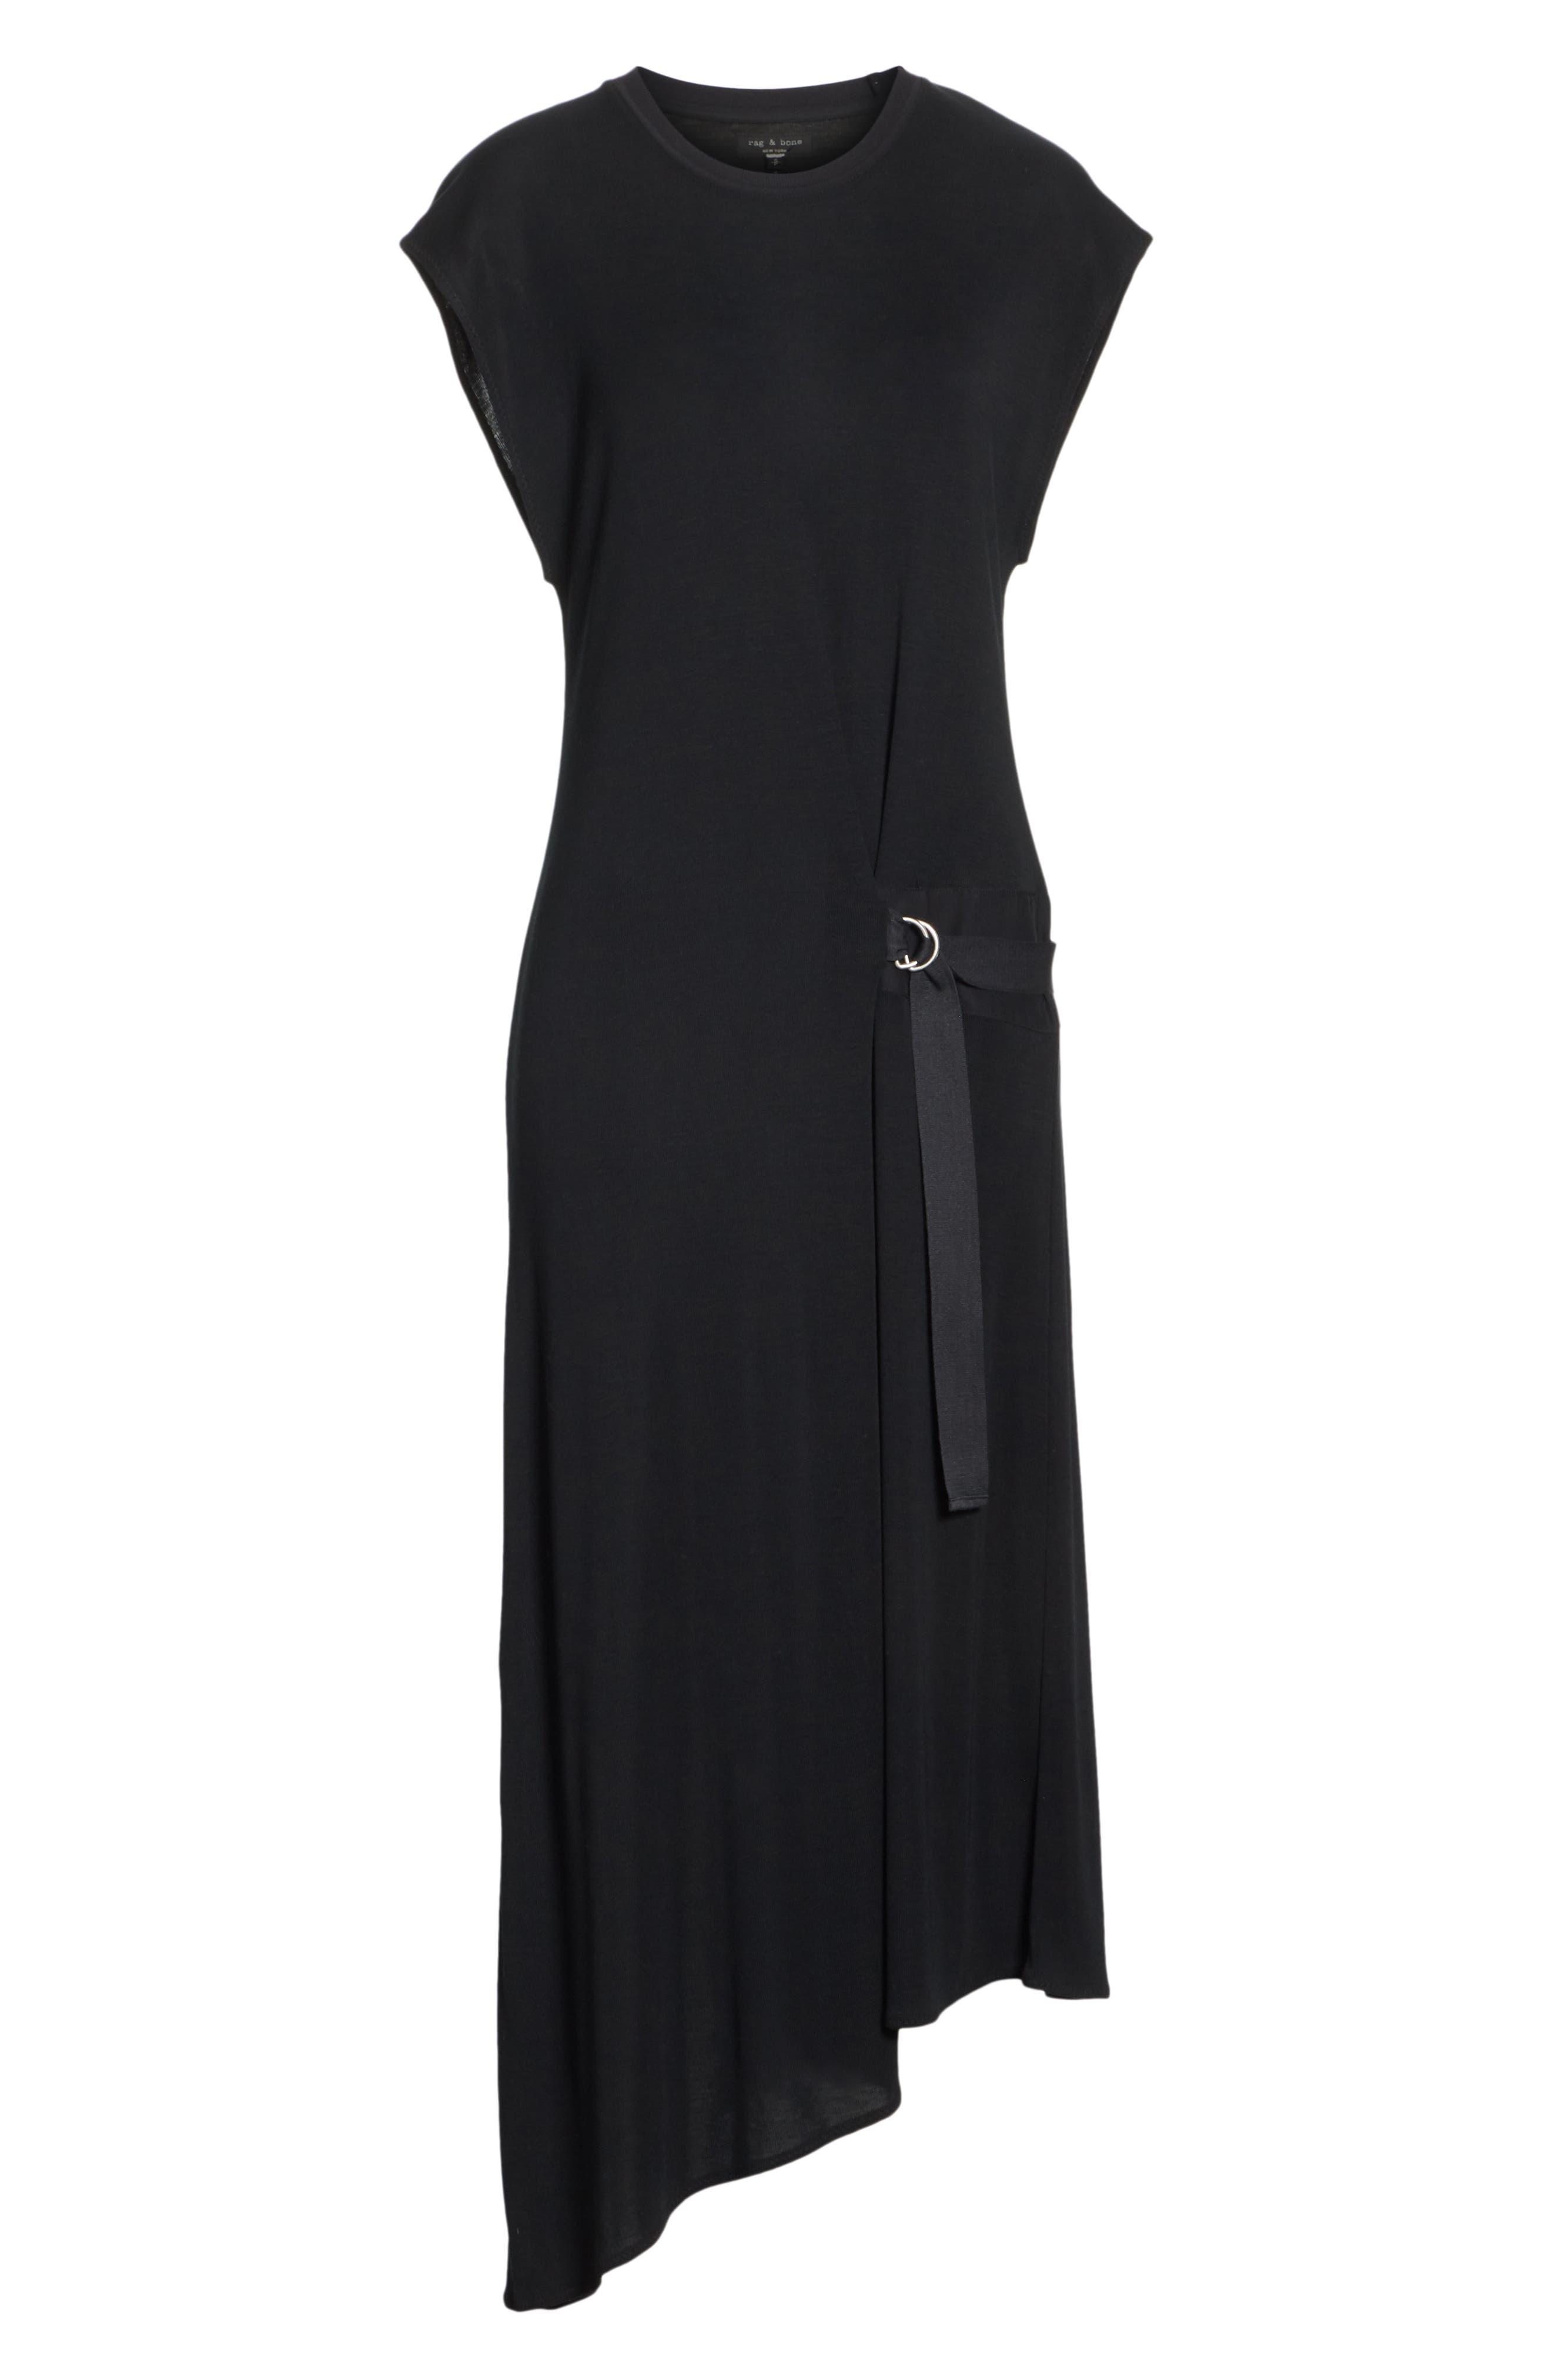 Ophelia Asymmetrical Dress,                             Alternate thumbnail 6, color,                             001